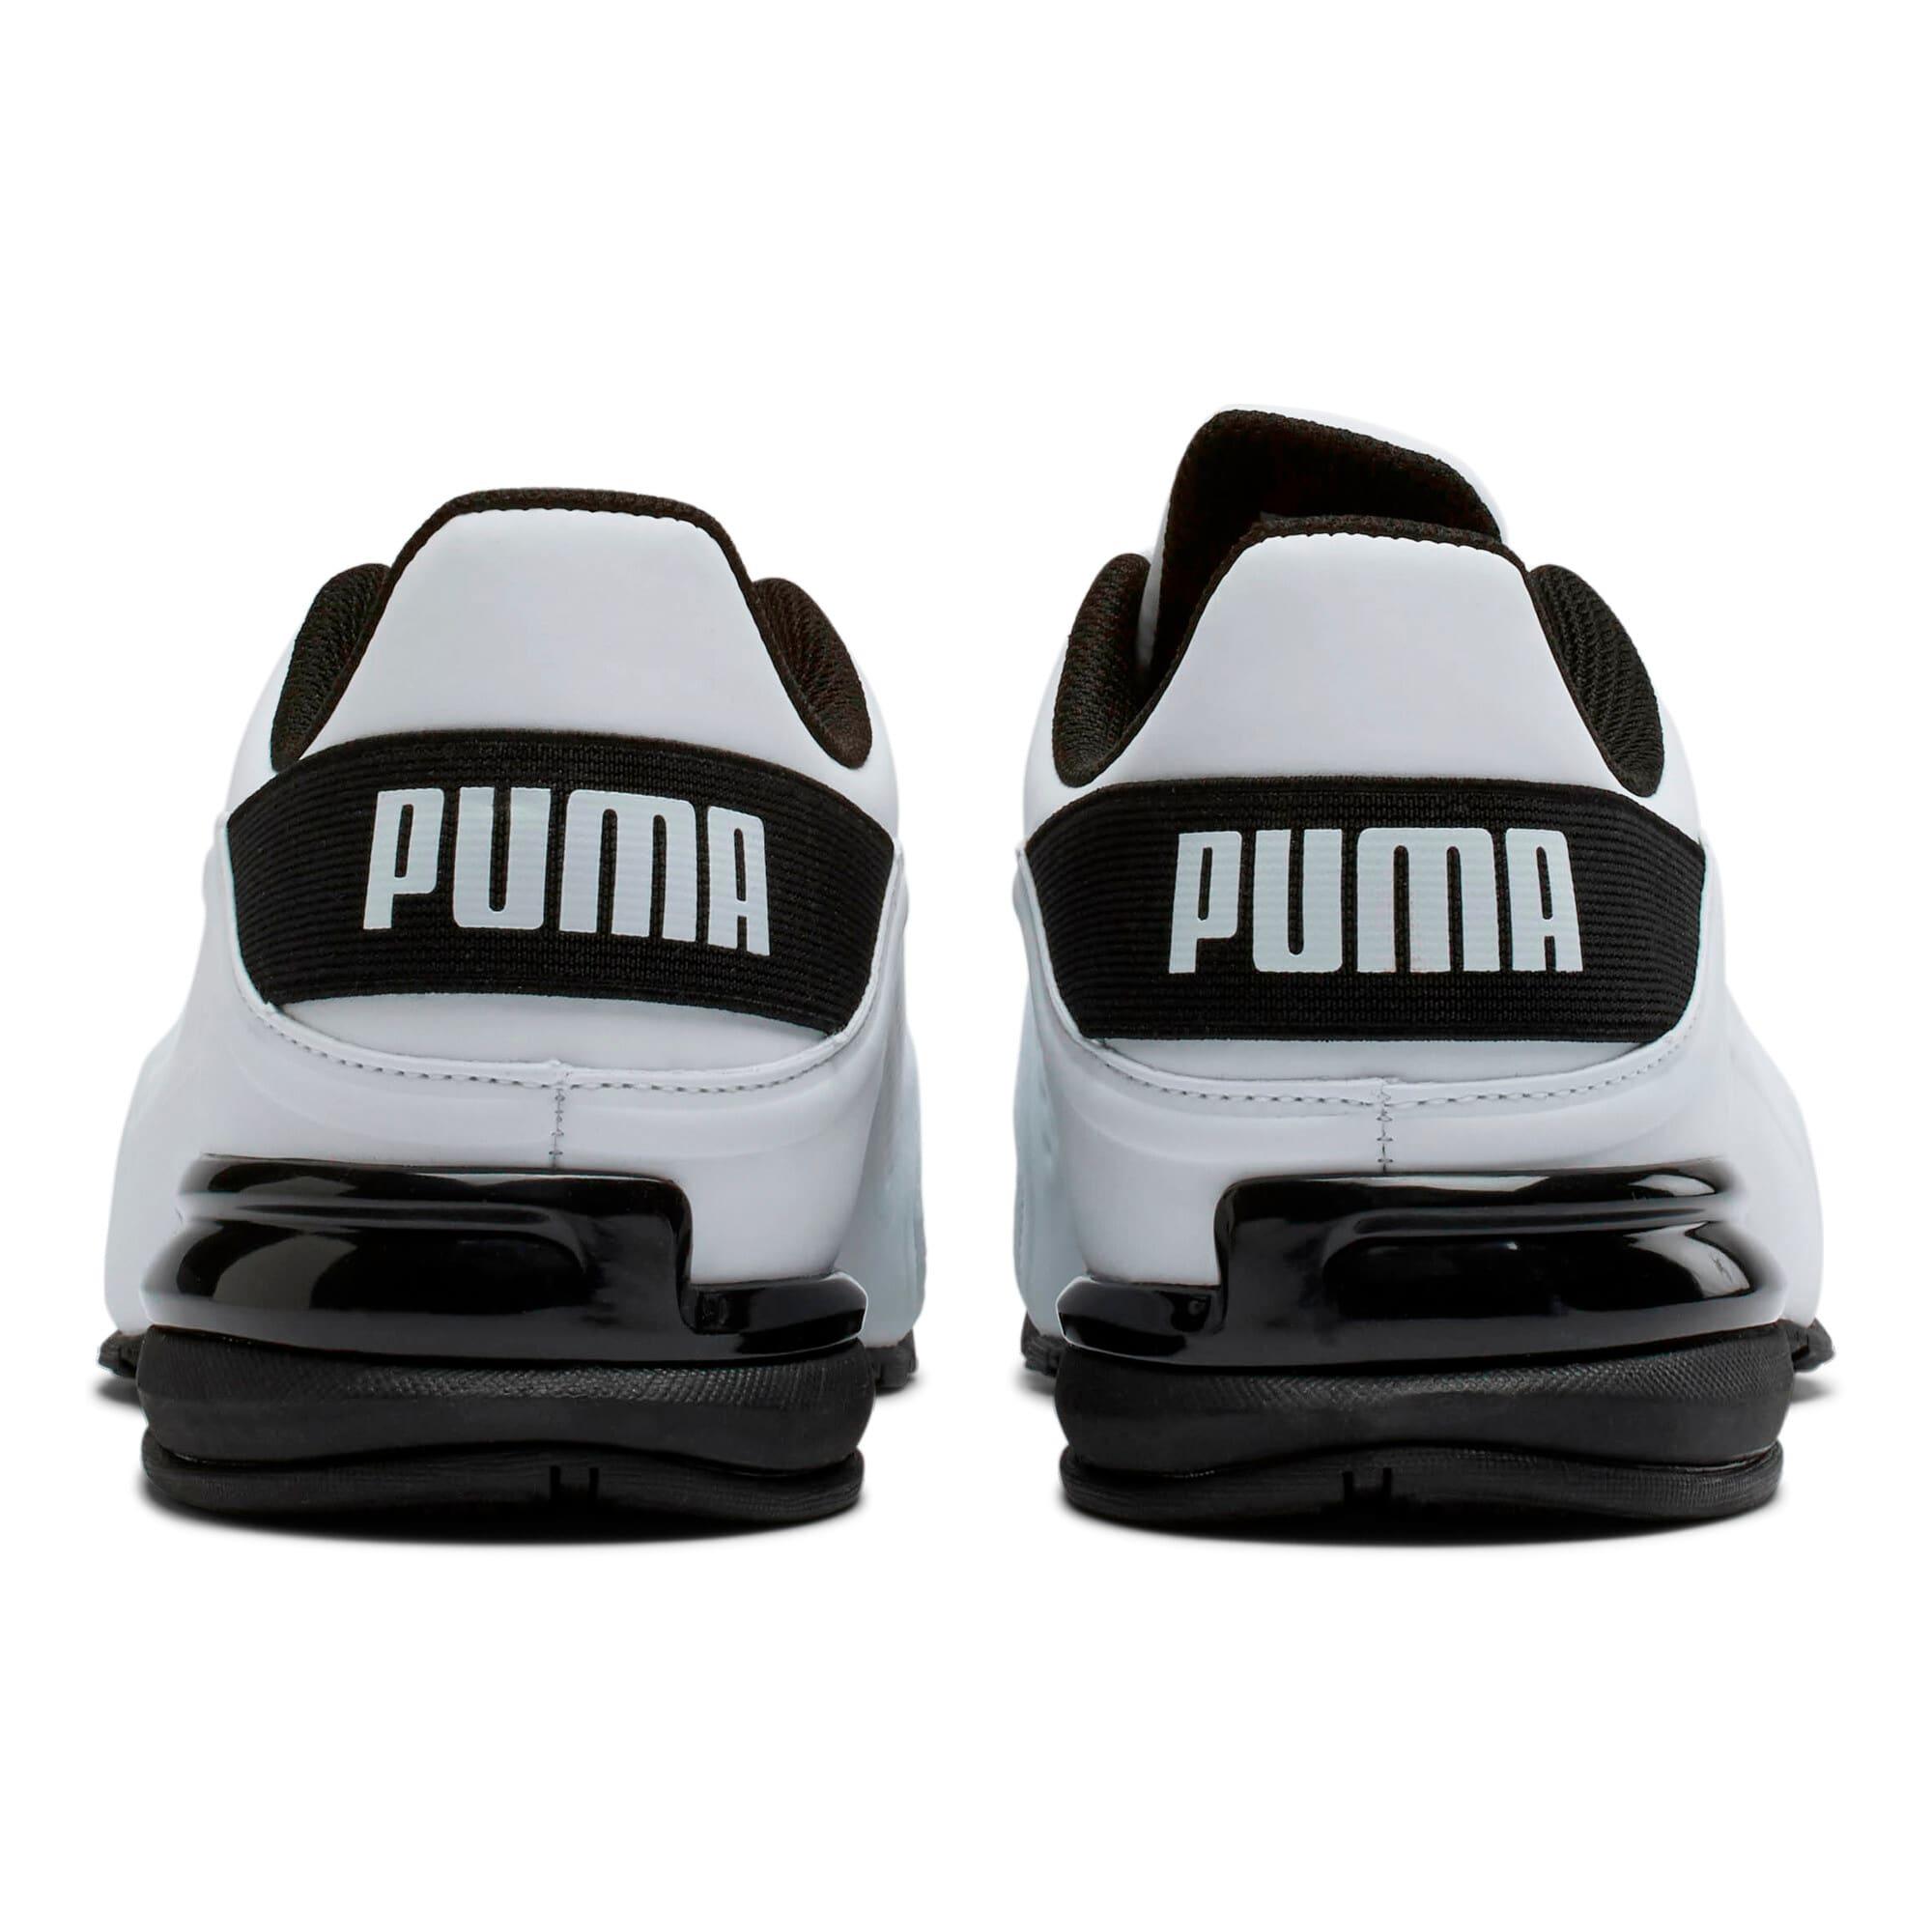 Thumbnail 3 of Viz Runner Men's Running Shoes, Puma White-Puma Black, medium